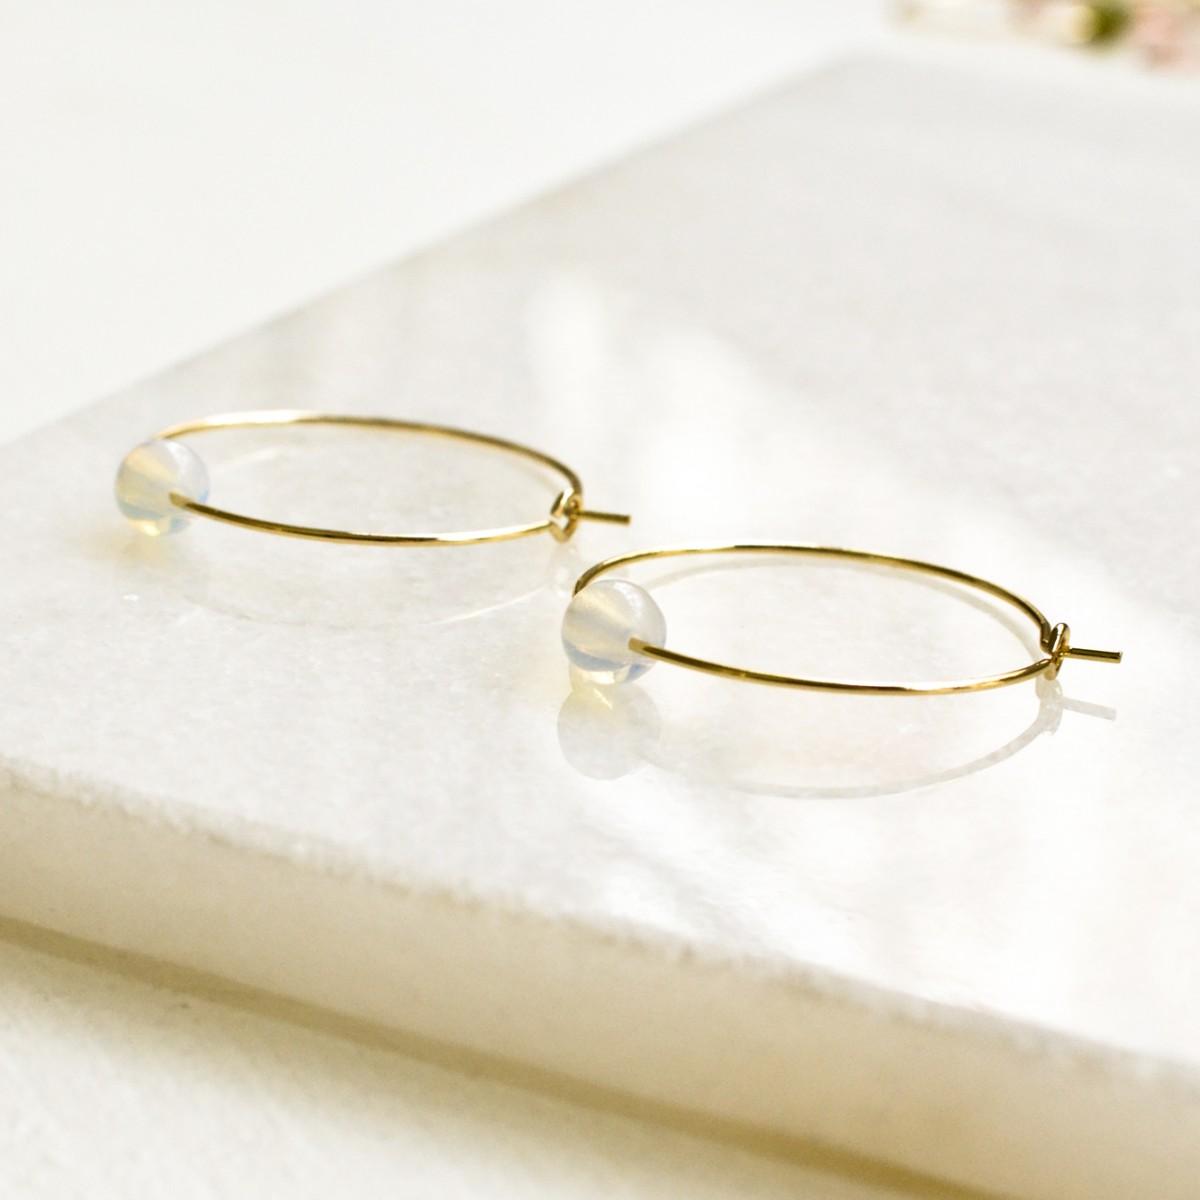 Gudbling // Vergoldete Kreolen mit Opalit